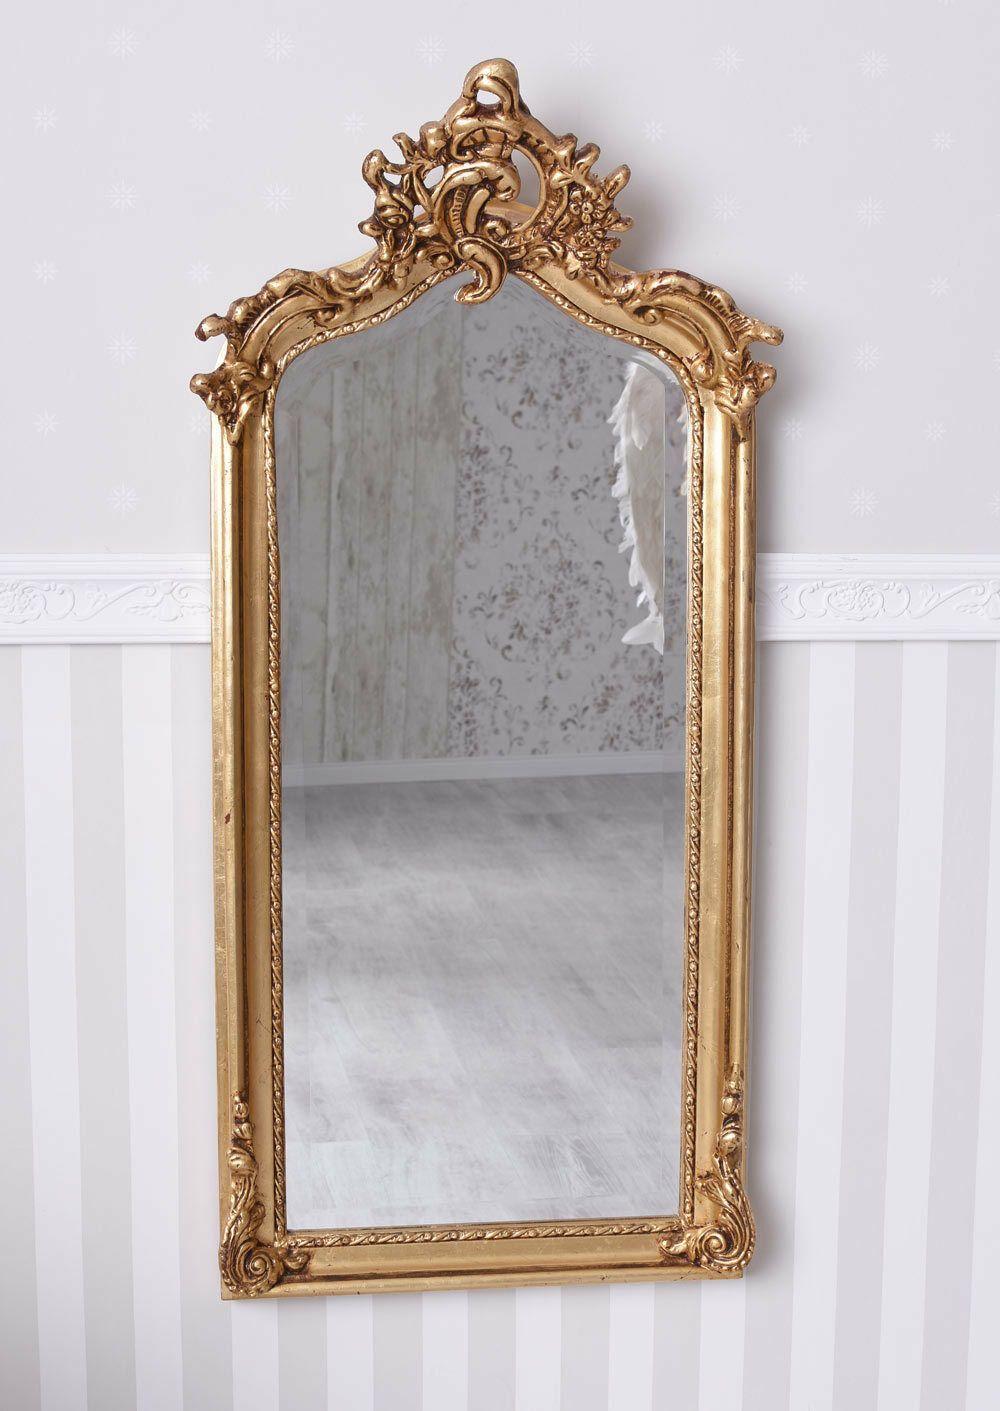 Wandspiegel Gold Spiegel Rokoko Holzspiegel Prunkspiegel Barock Badspiegel Ebay Wandspiegel Spiegel Holz Barocker Spiegel